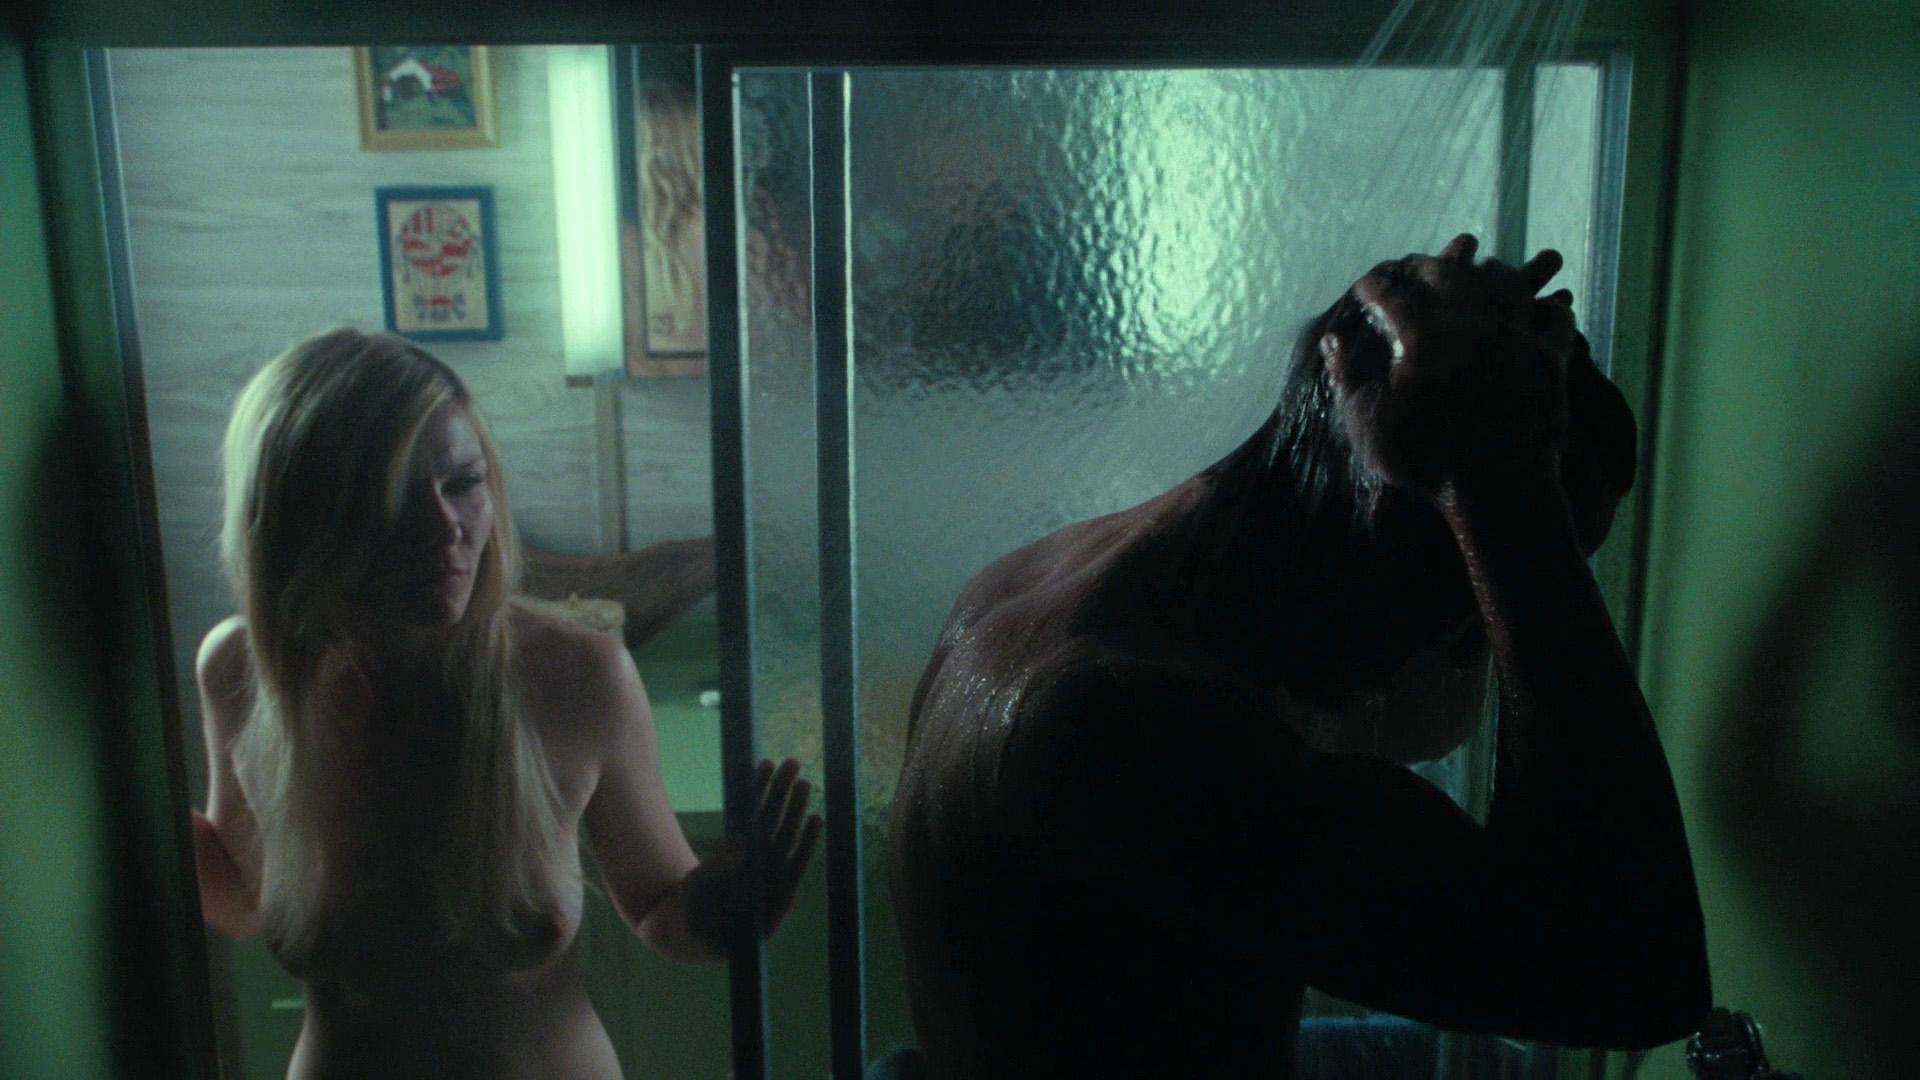 Leaked Milana Vayntrub nude photos 2019